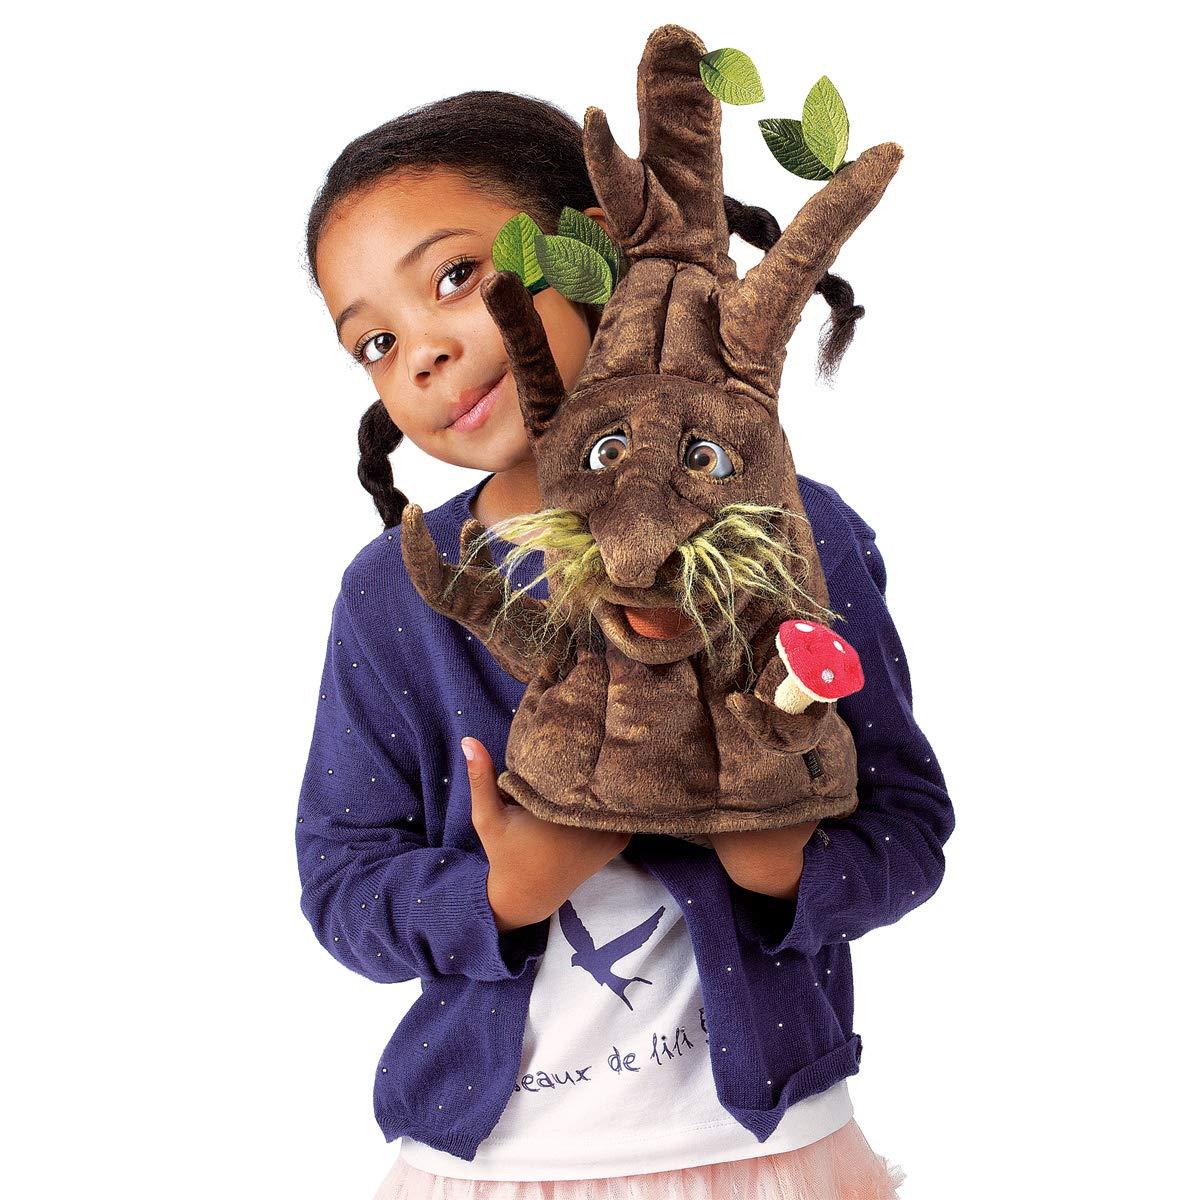 Zauberhafter Baum Folkmanis Puppets 2950